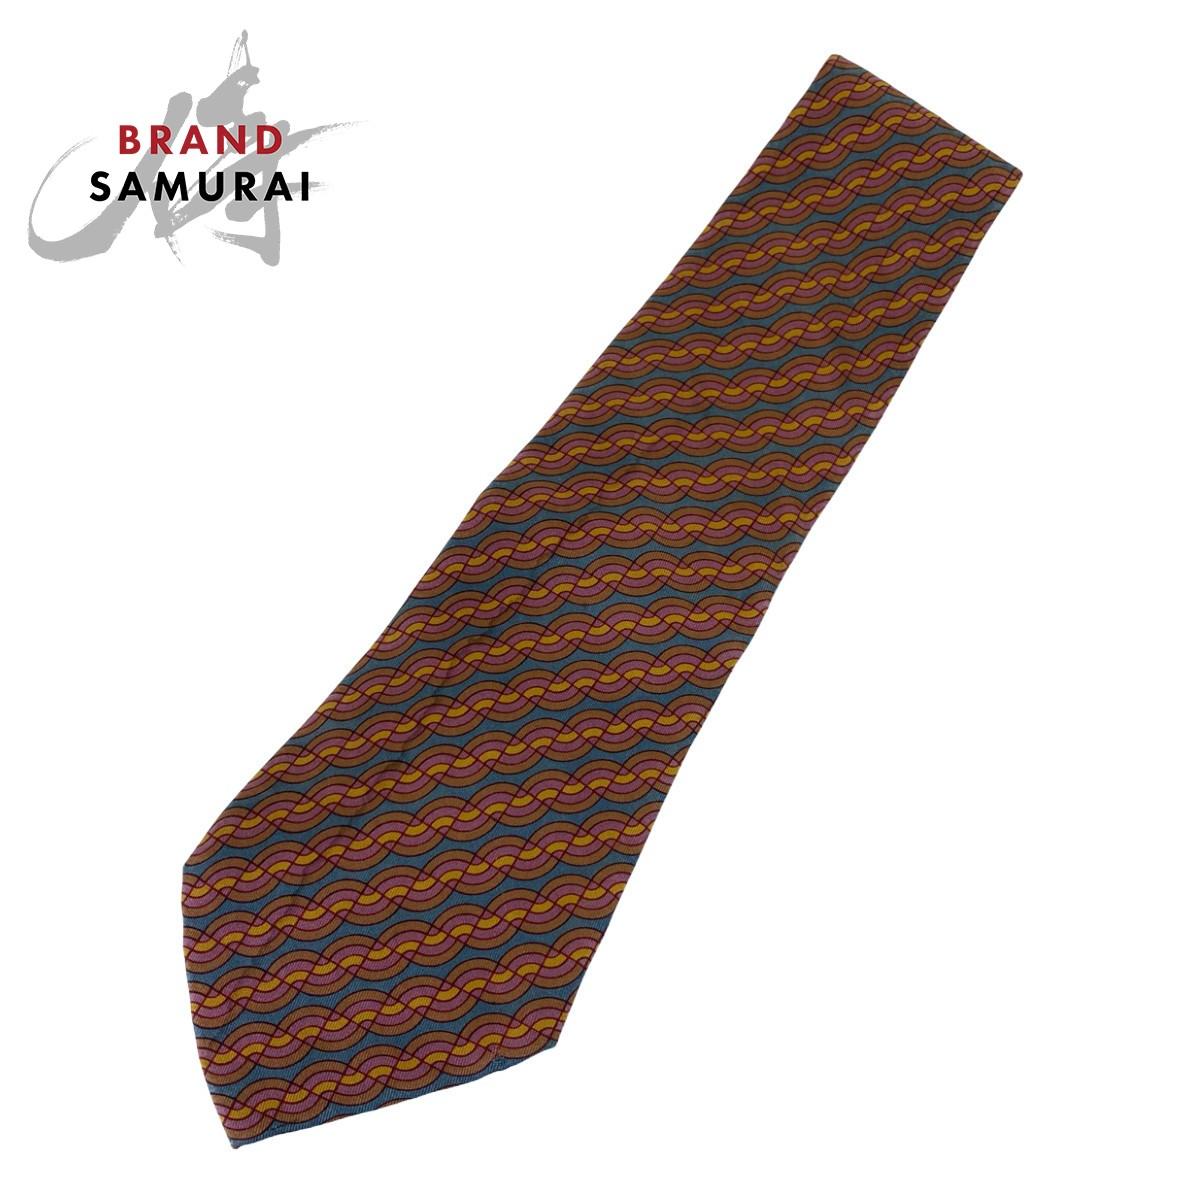 BRAND SAMURAI HERMES エルメス 波模様 驚きの価格が実現 卓出 総柄 マルチカラー 剣先10.0cm シルク 中古 ネクタイ 102819 メンズ